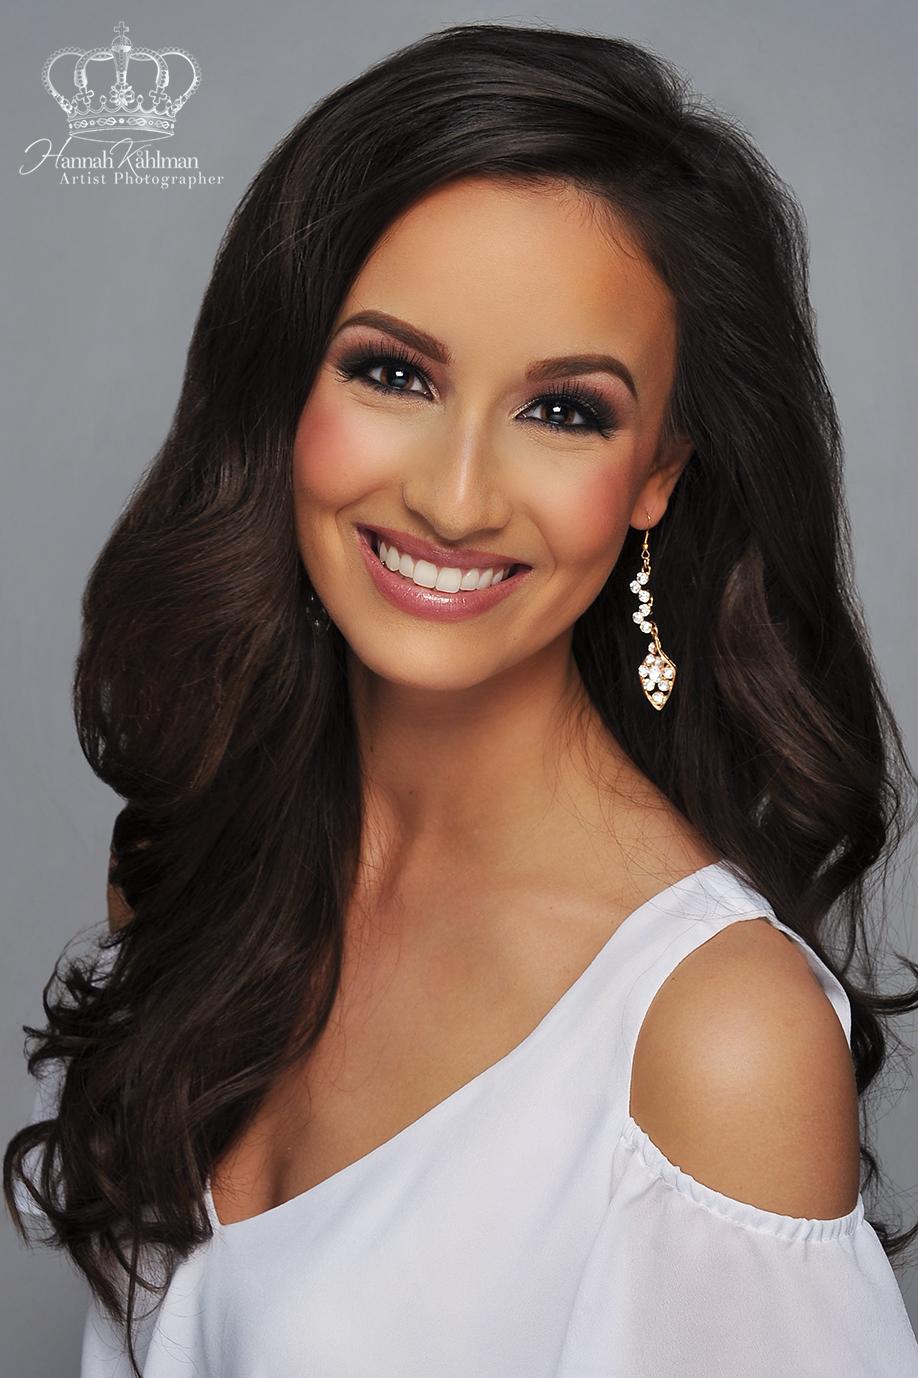 Miss_Alaska_Headshot_for_Miss_America_Pageant_Headshot_Photographer_Anchorage_Alaska_Hannah_Kåhlman_